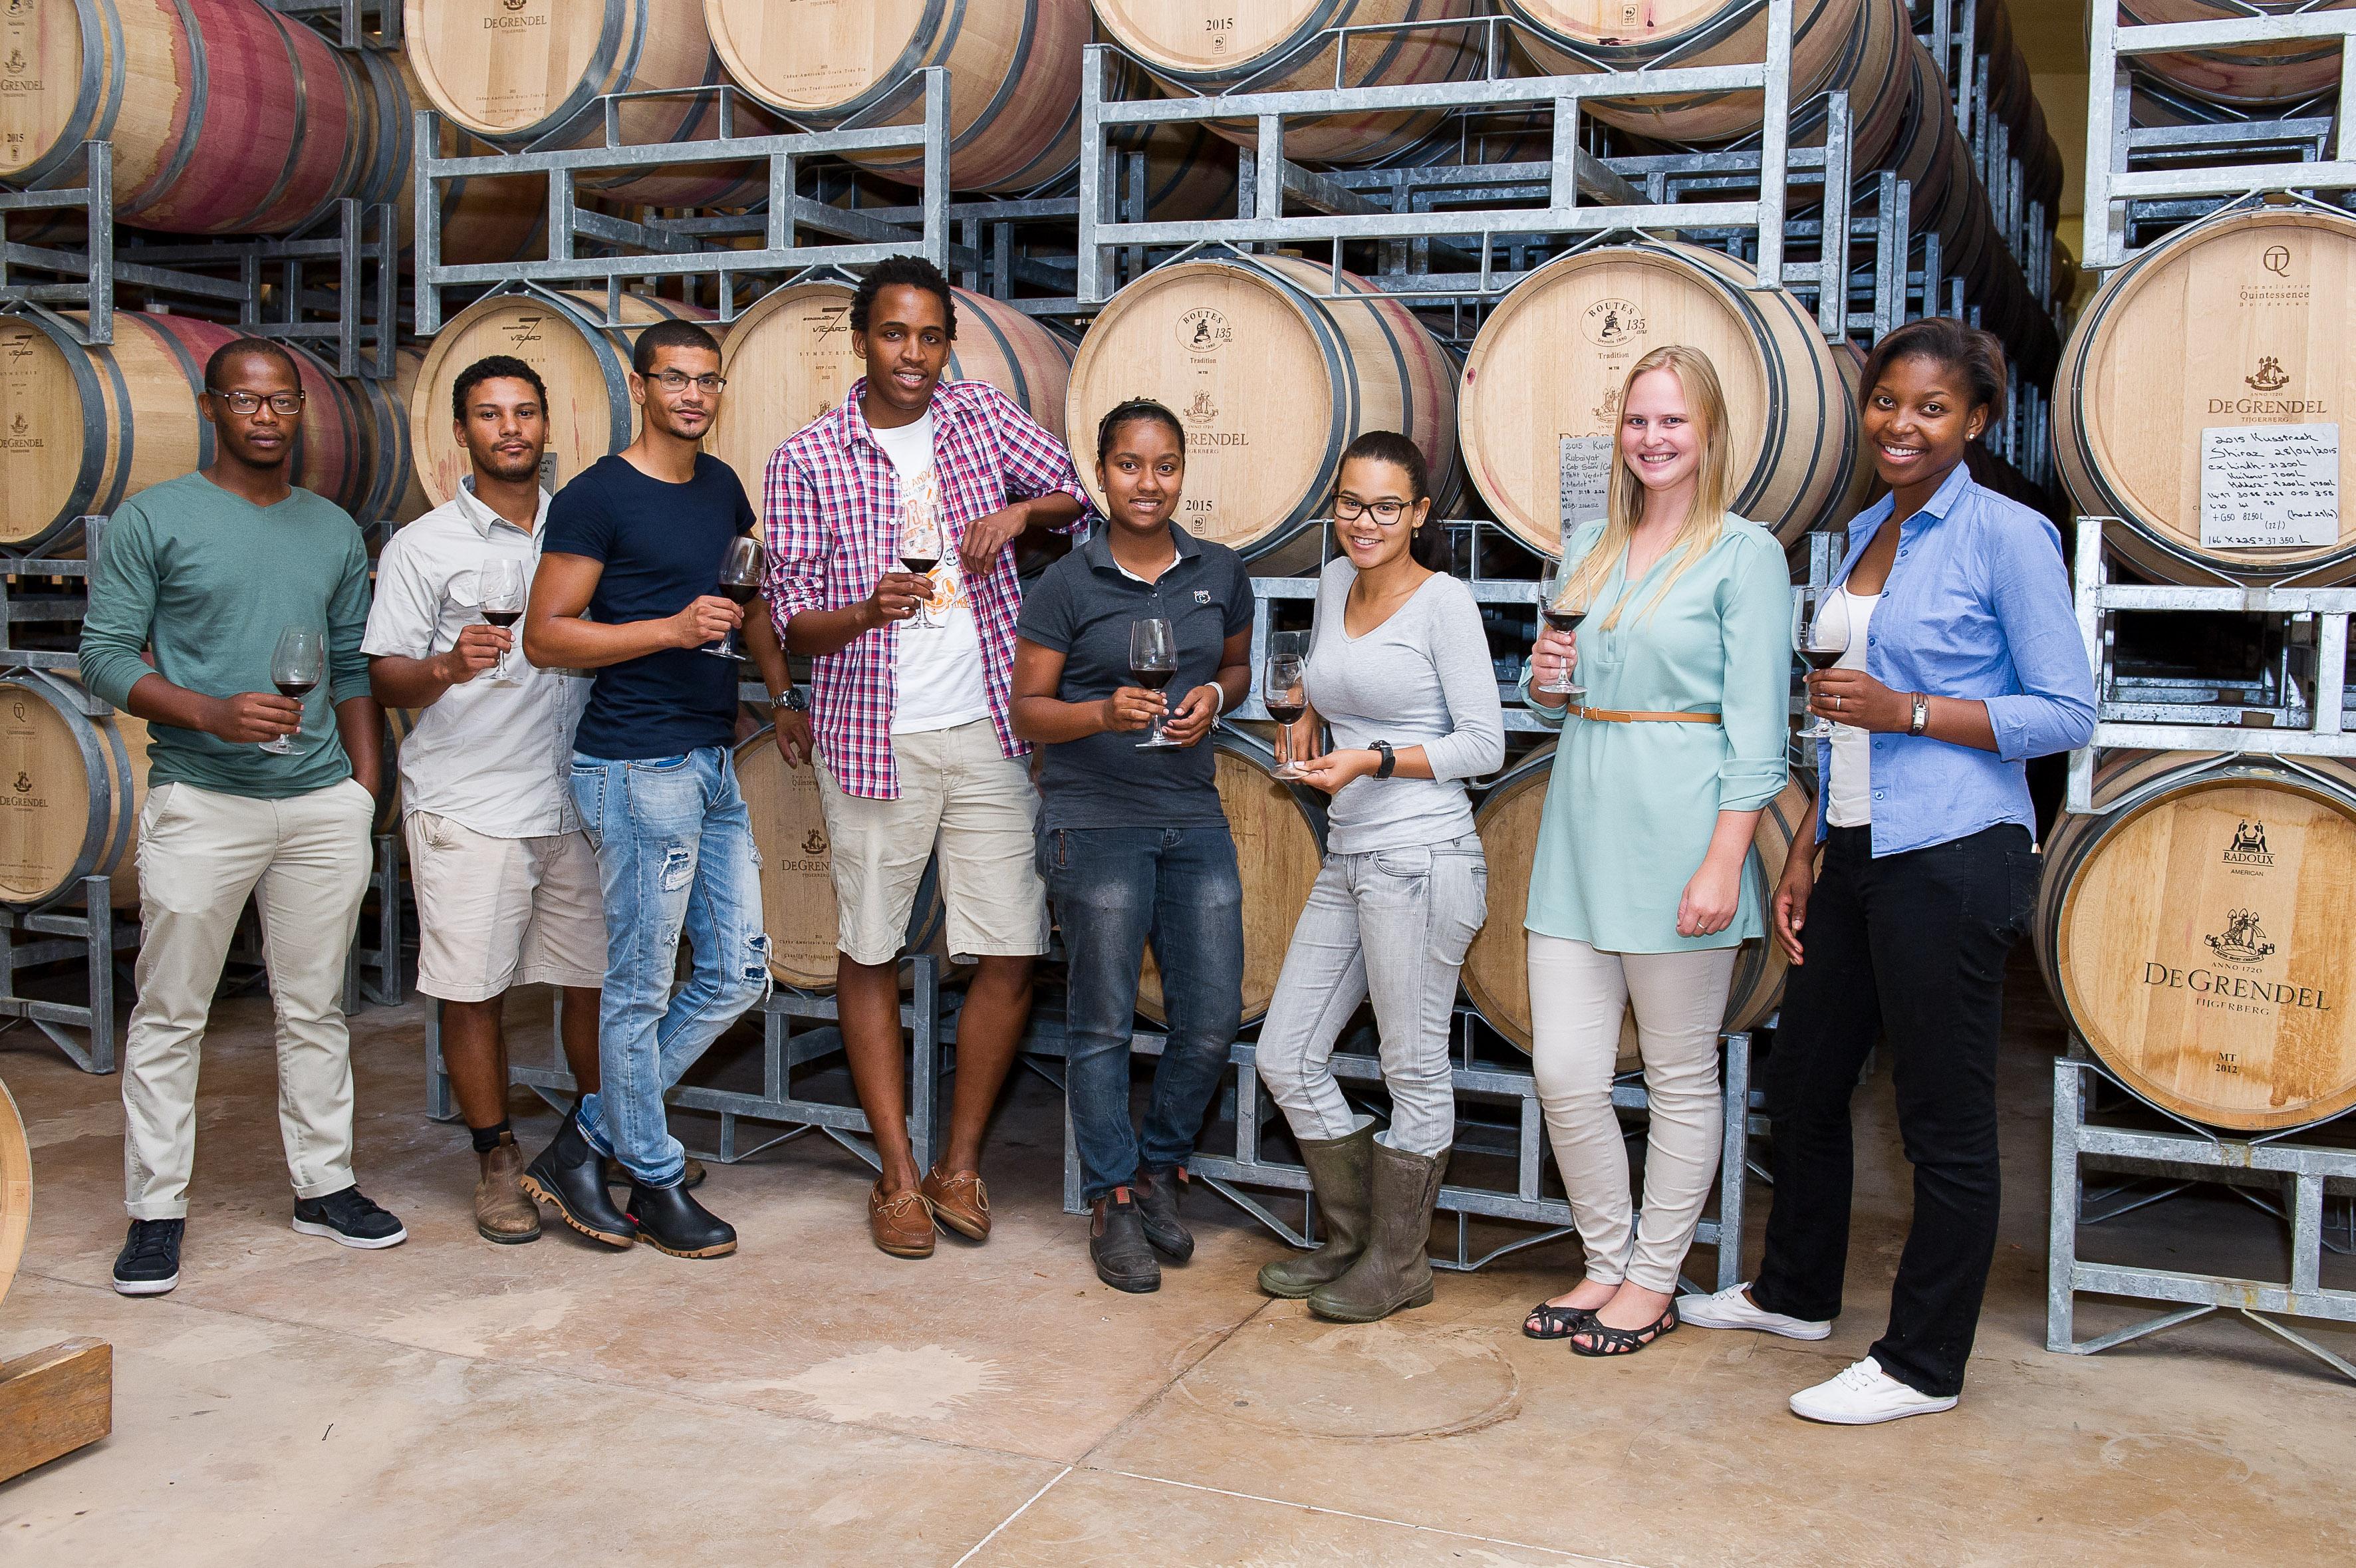 From left to right Banele Vakele, Logan Jooste, Clayton Christiaans, Sydney Mello, Rose Kruger, Kiara Scott, Maryna Huysamen, Mahalia Kotjane HR